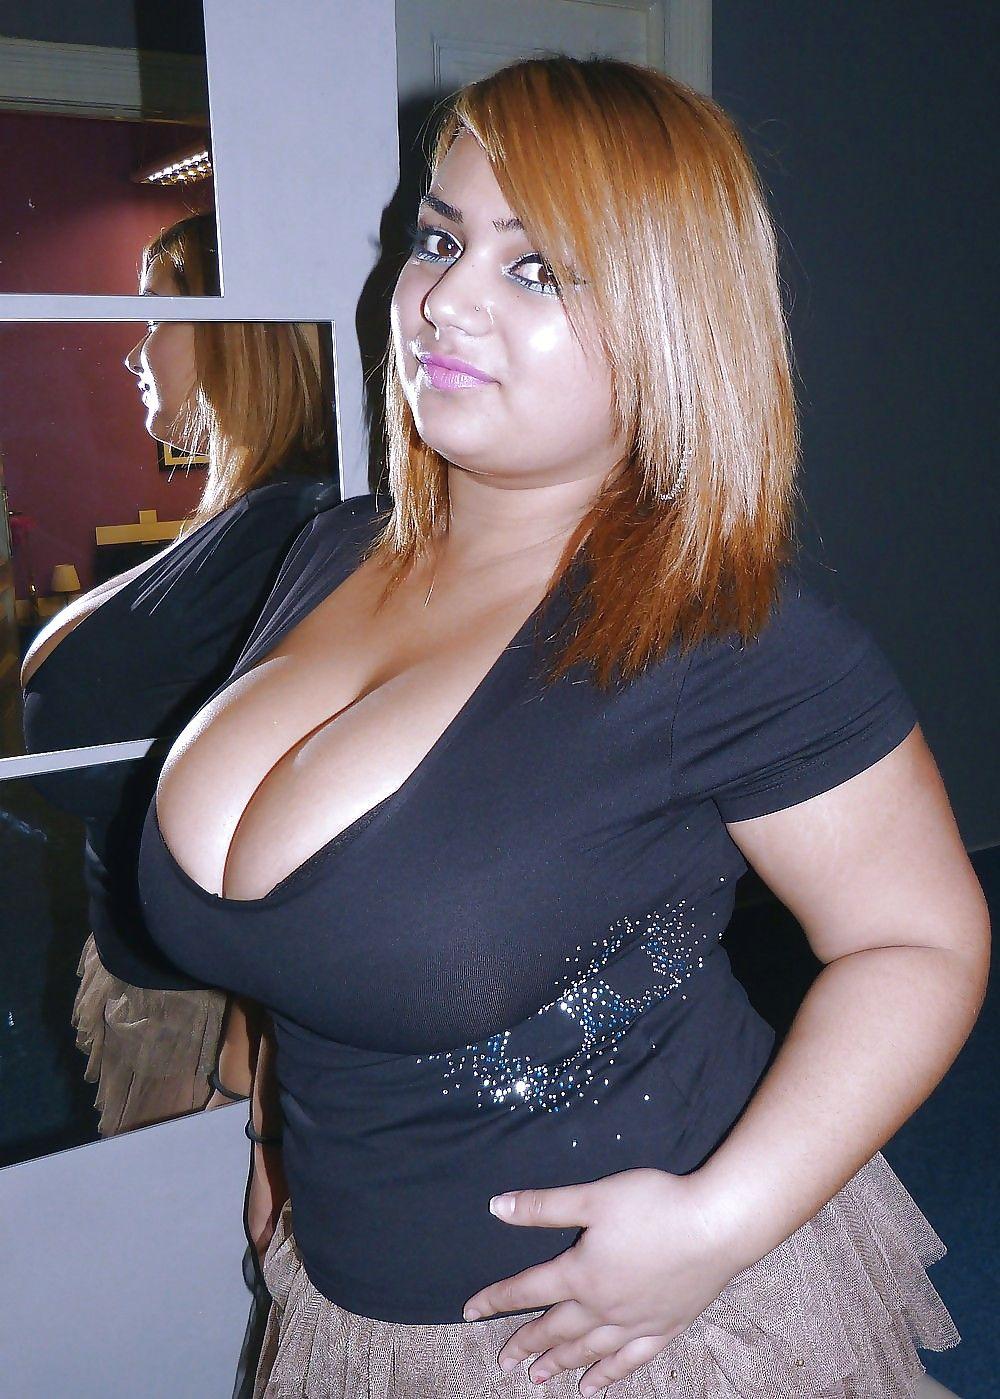 Fat Girl Small Tits